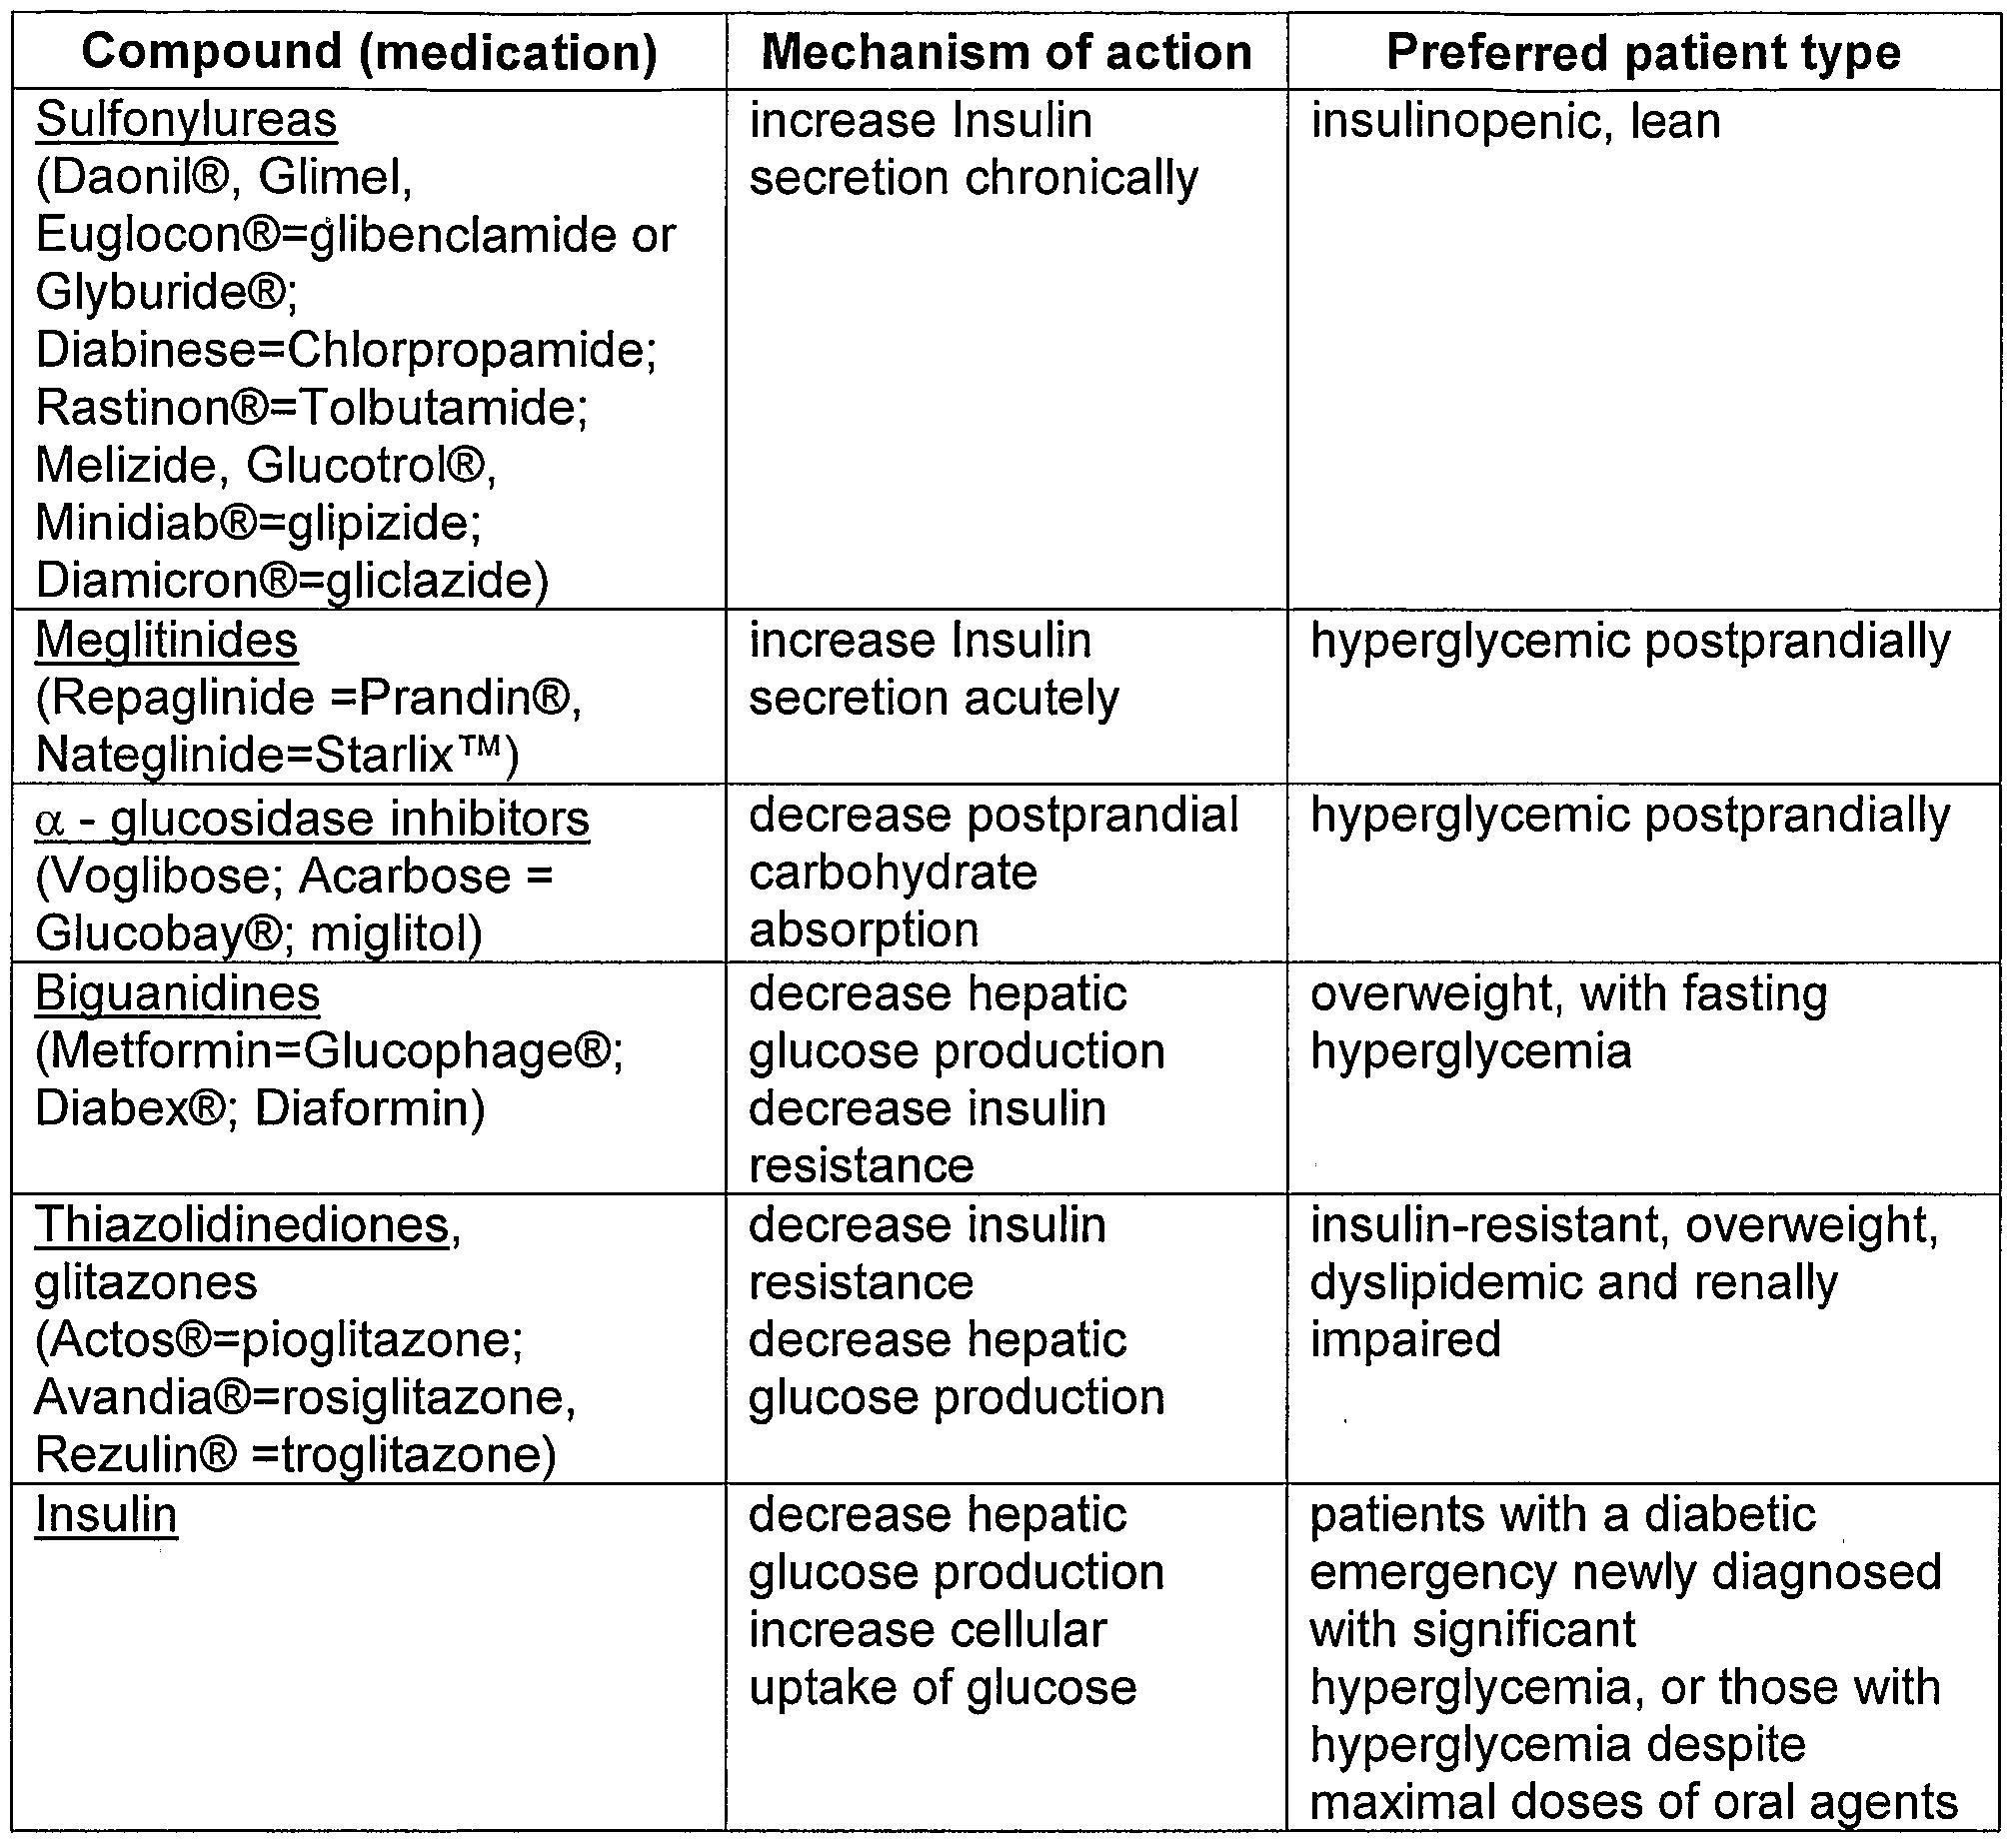 Hypoglycemic Agents (Antidiabetics)